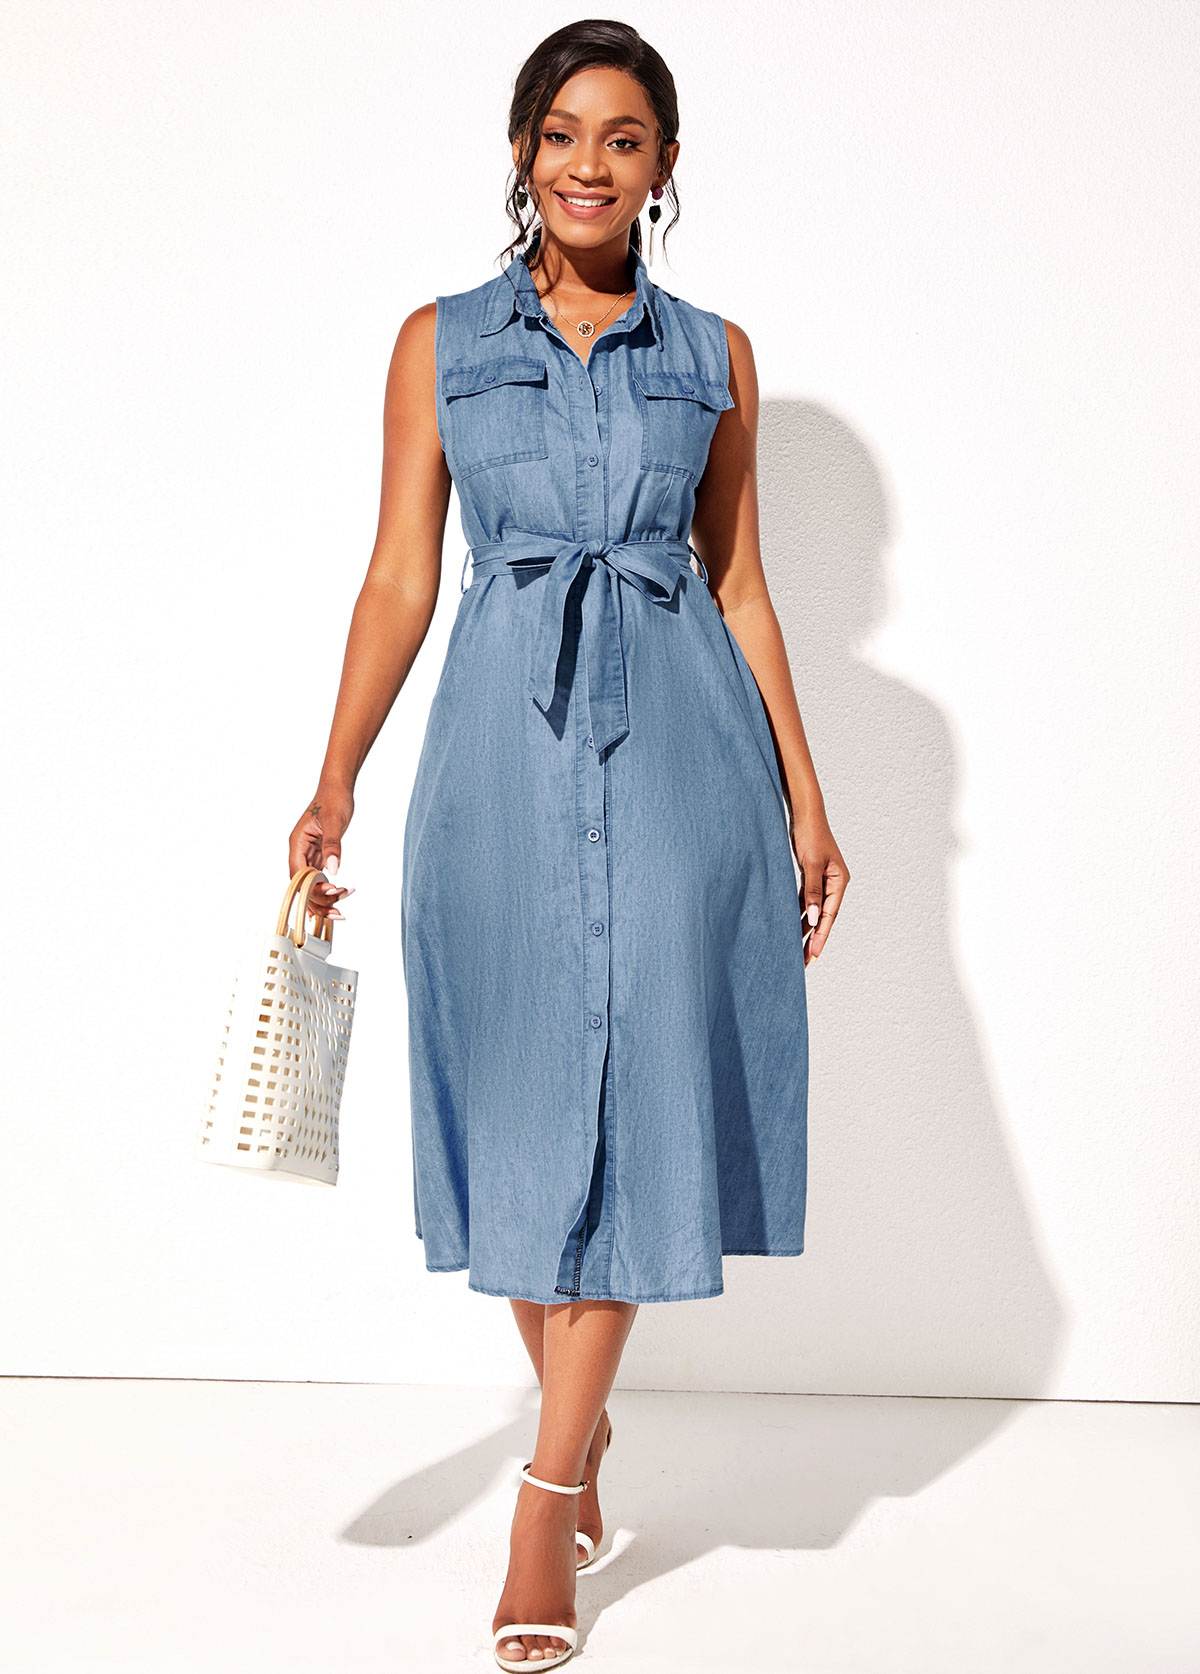 Demin Sleeveless Turndown Collar Button Up Dress